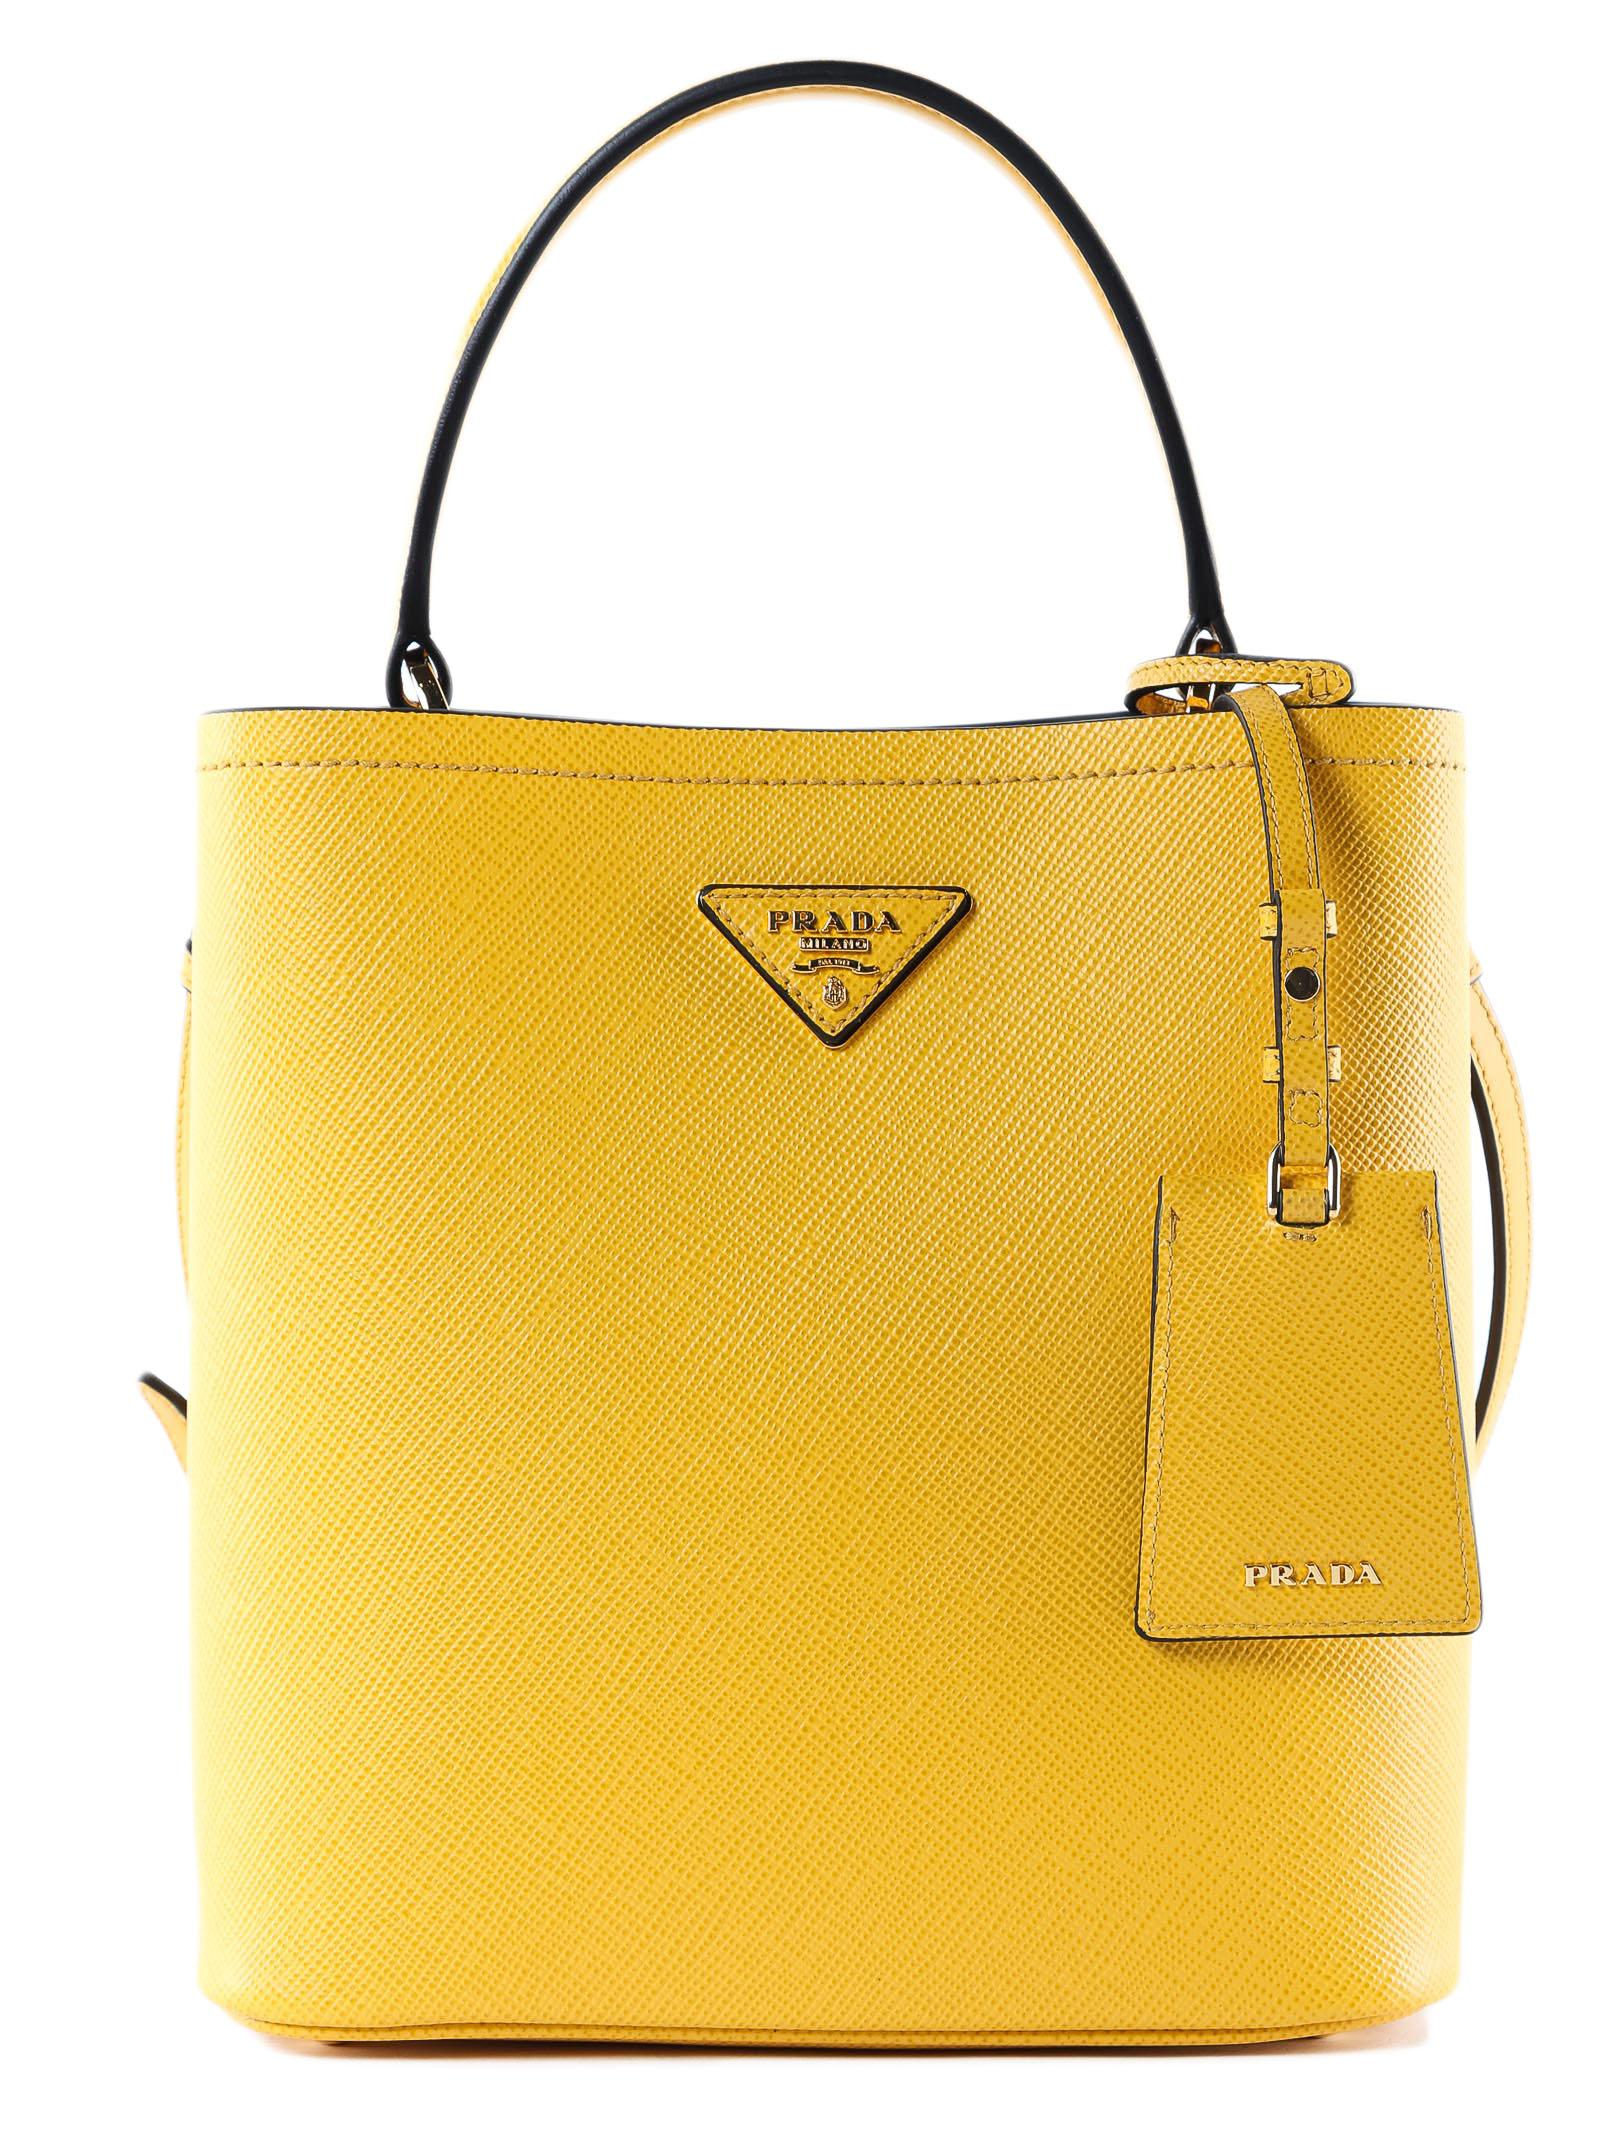 4dd1ef211b6a Prada - Yellow Handbag Saffiano+city Calf - Lyst. View fullscreen